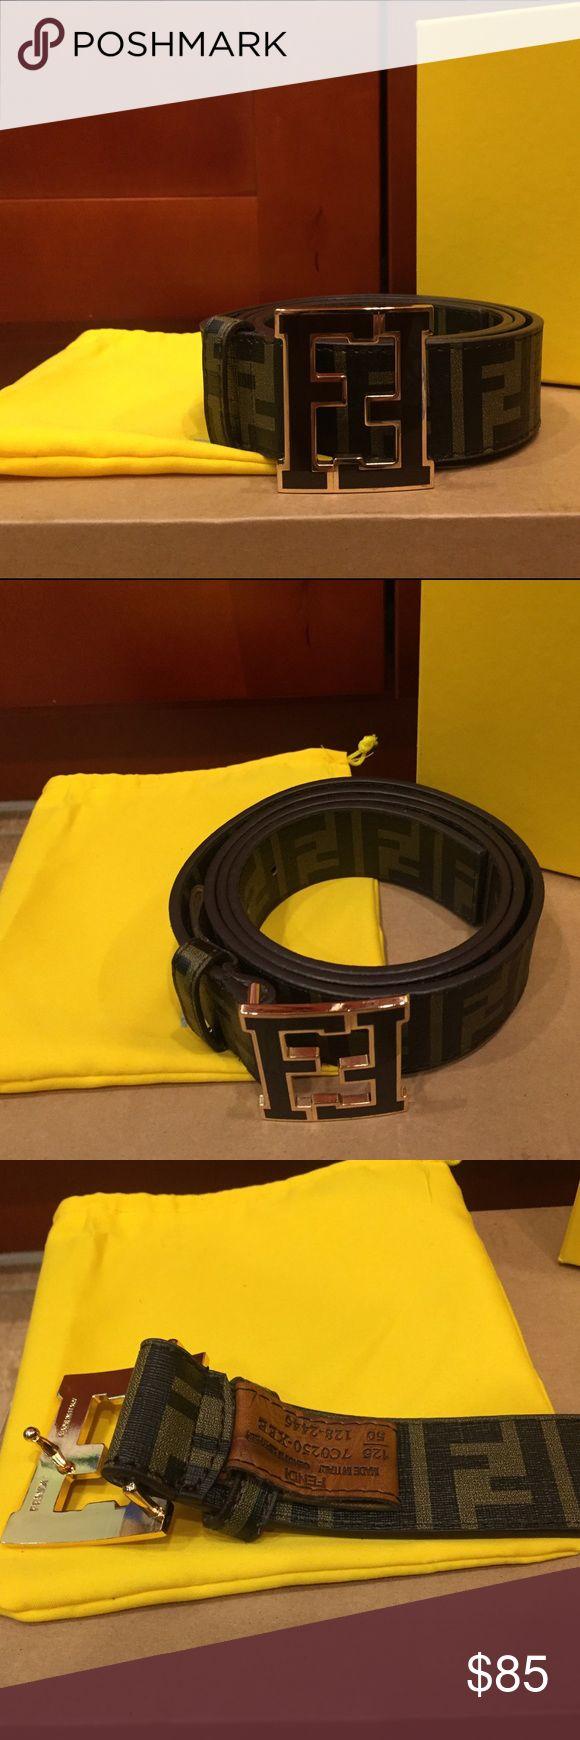 ***FLASH SALE - PRICE NON NEGOTIABLE*** Fendi Zucca Tobacco College Belt. Brand New with dust bag and box. Fendi Accessories Belts